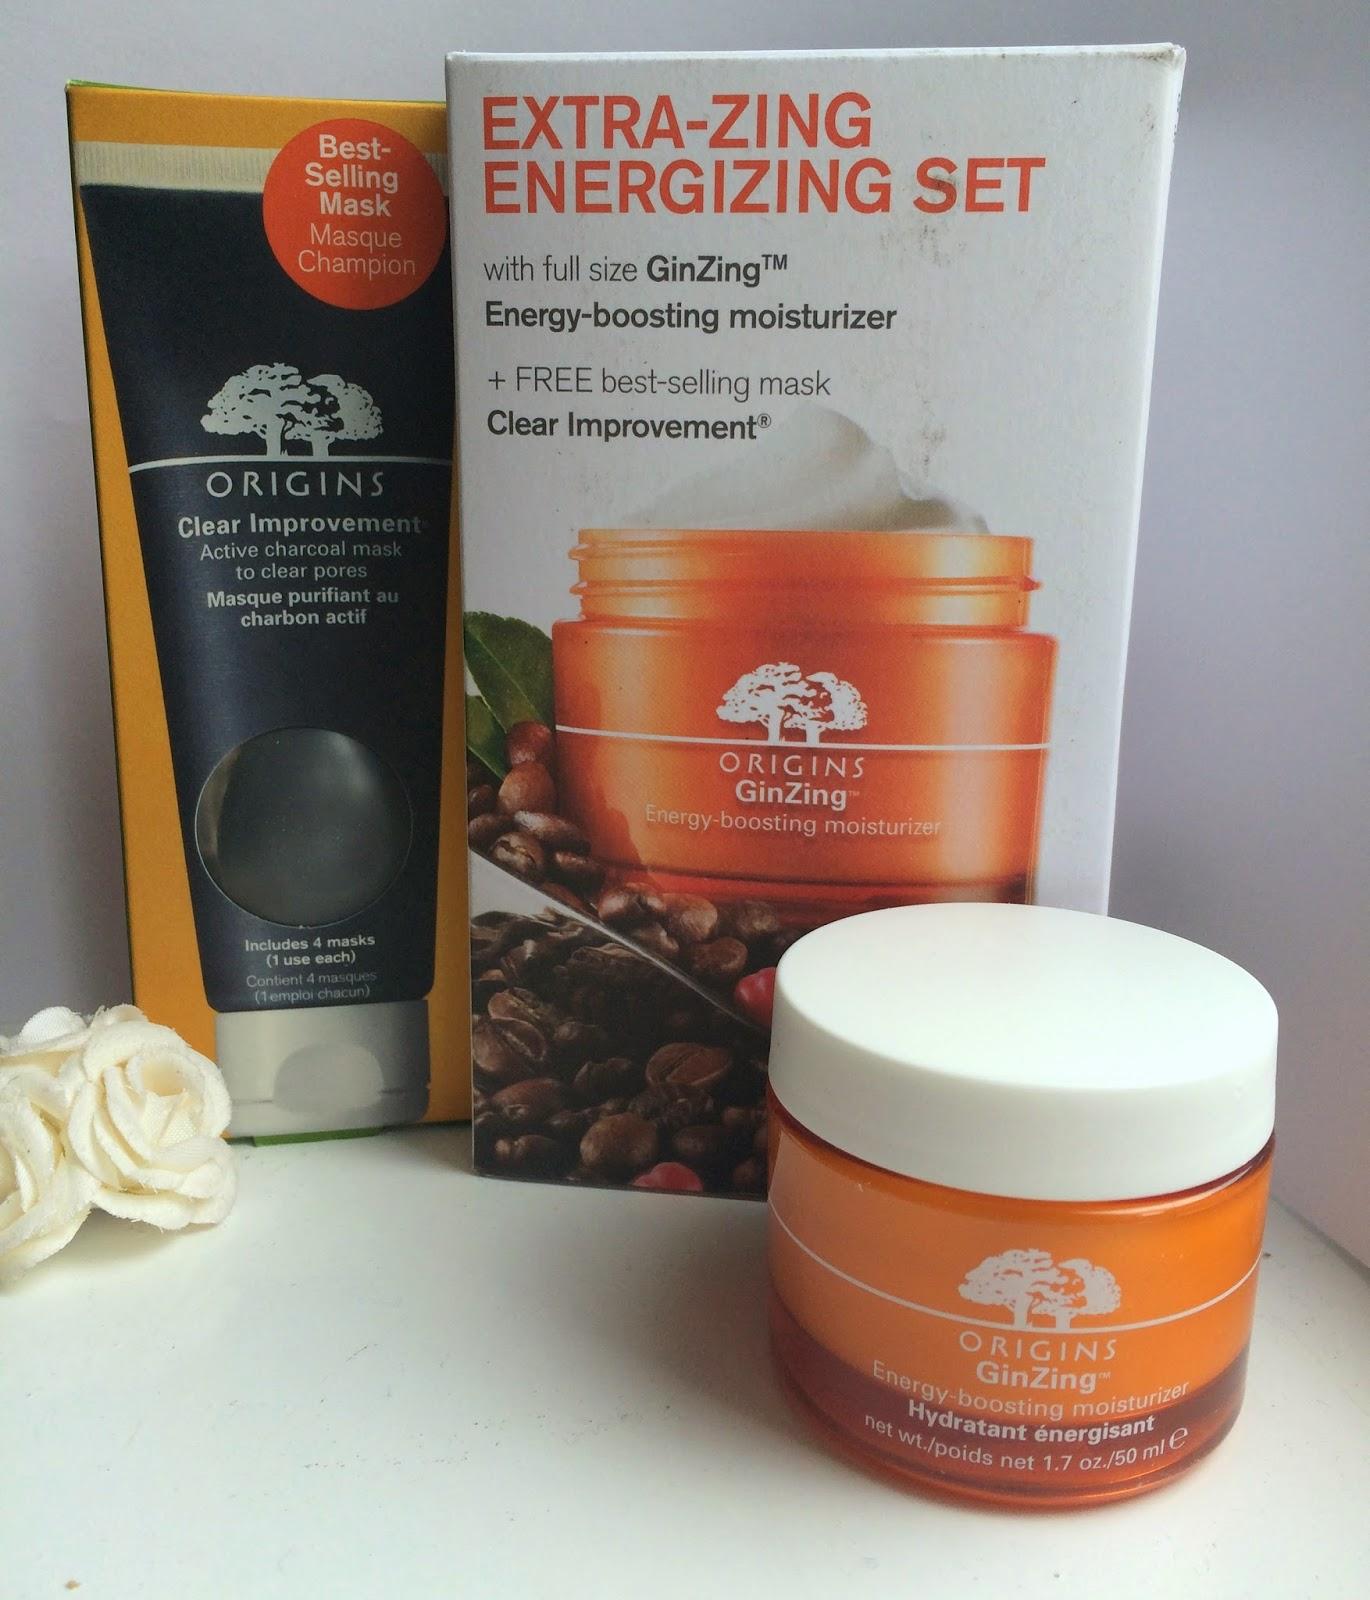 origins-ginzing-moisturiser-set